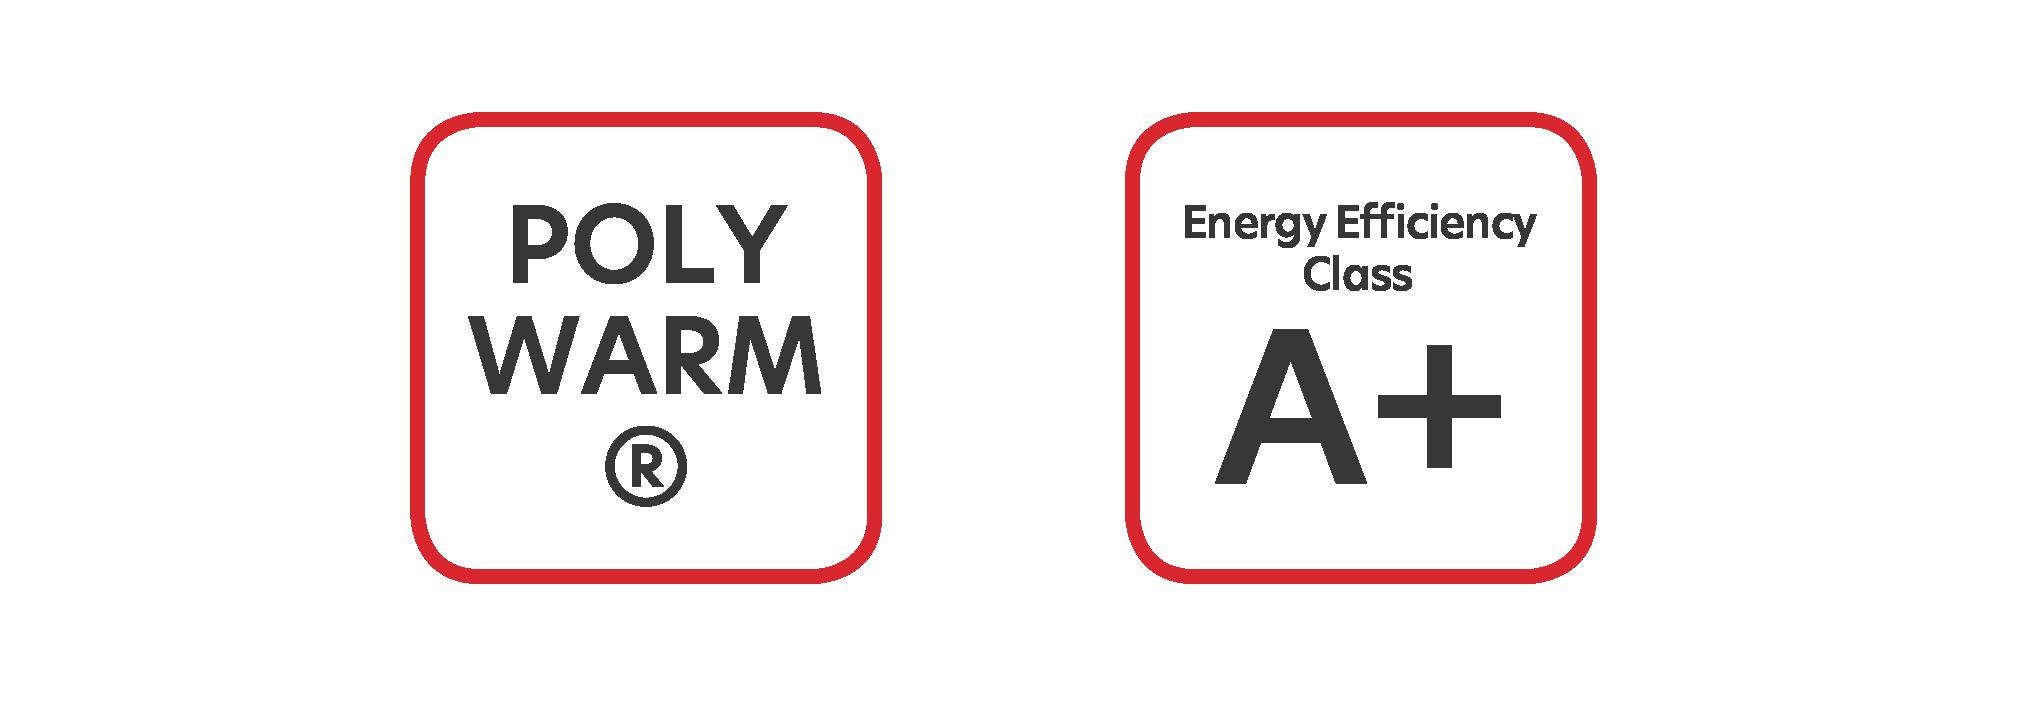 Polywarm, Energy Efficiency Class C